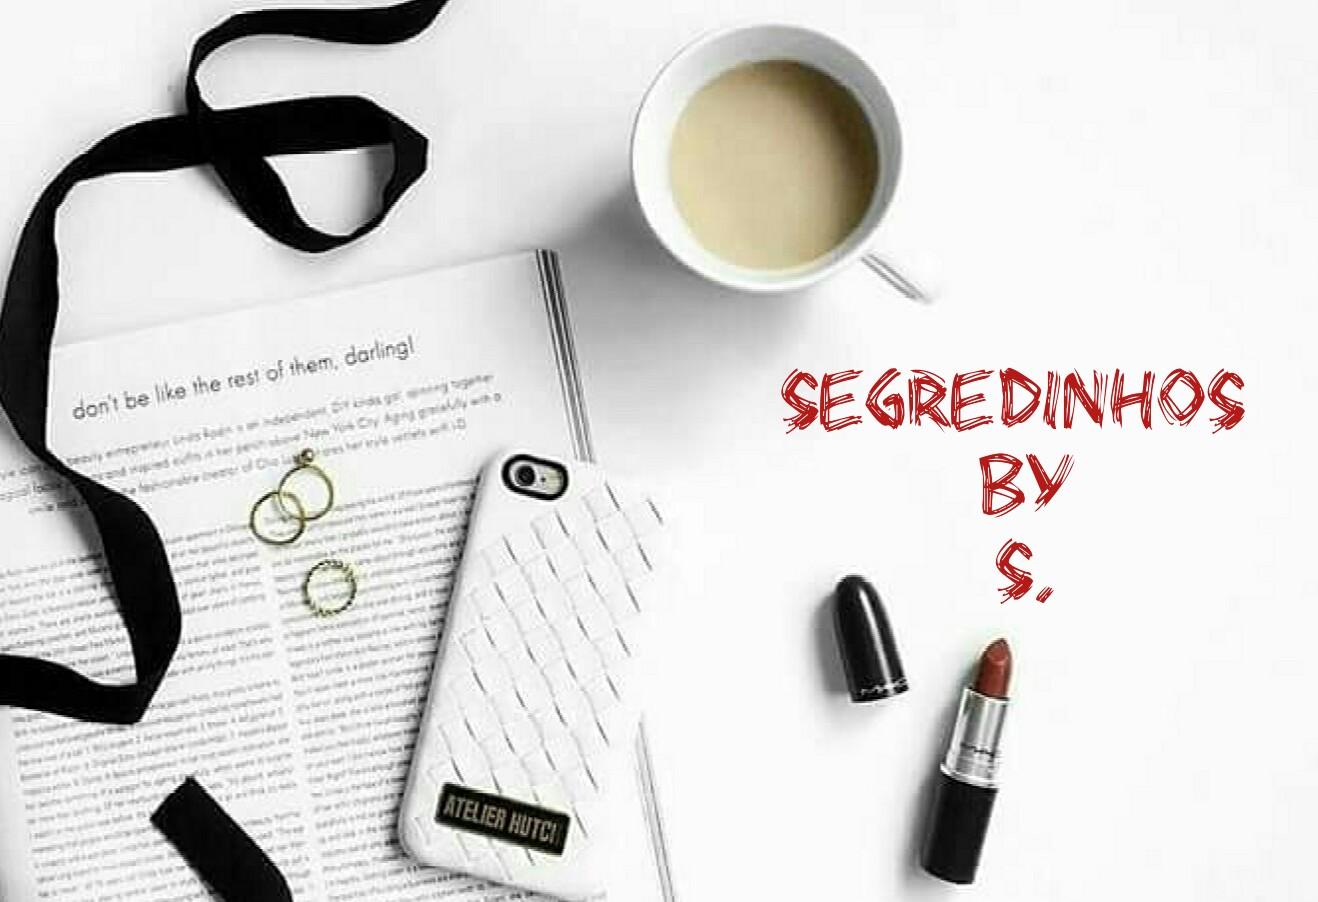 Segredinhos by S.